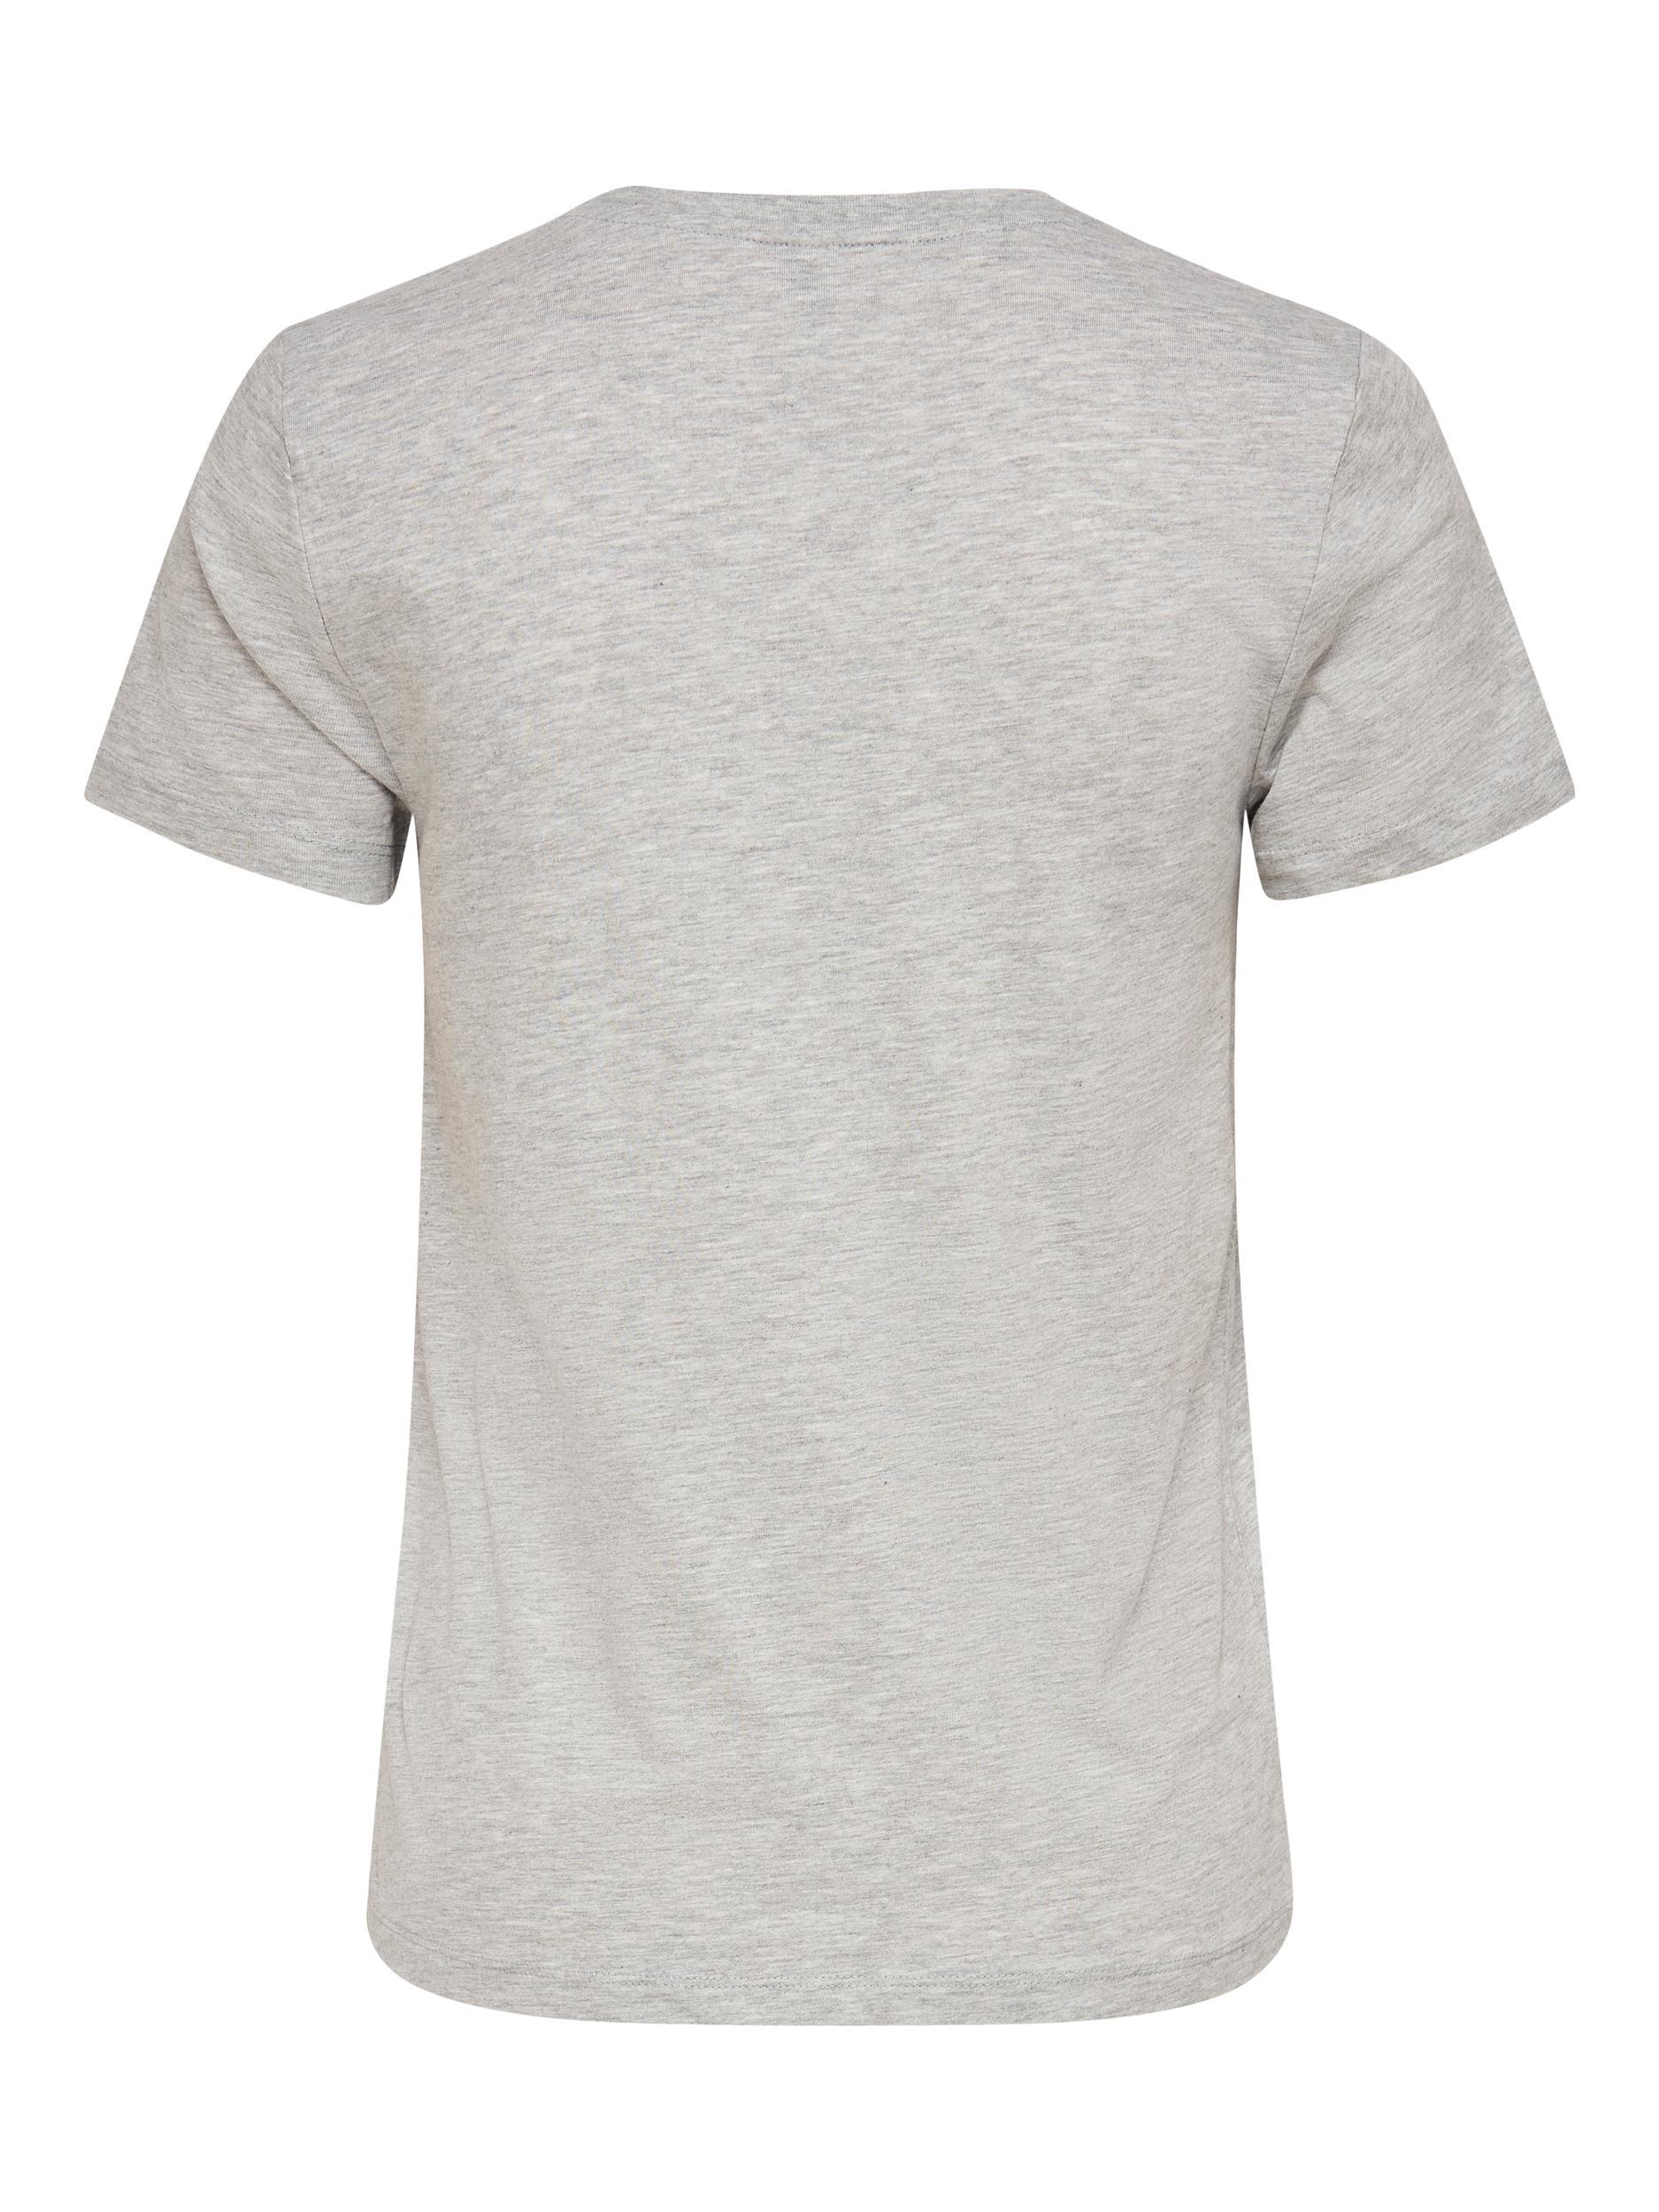 ONLKITA LIFE REG S/S PIN BOX TOP JRS ONLY | T-shirt | 15226044LIGHT GREY MELANGE